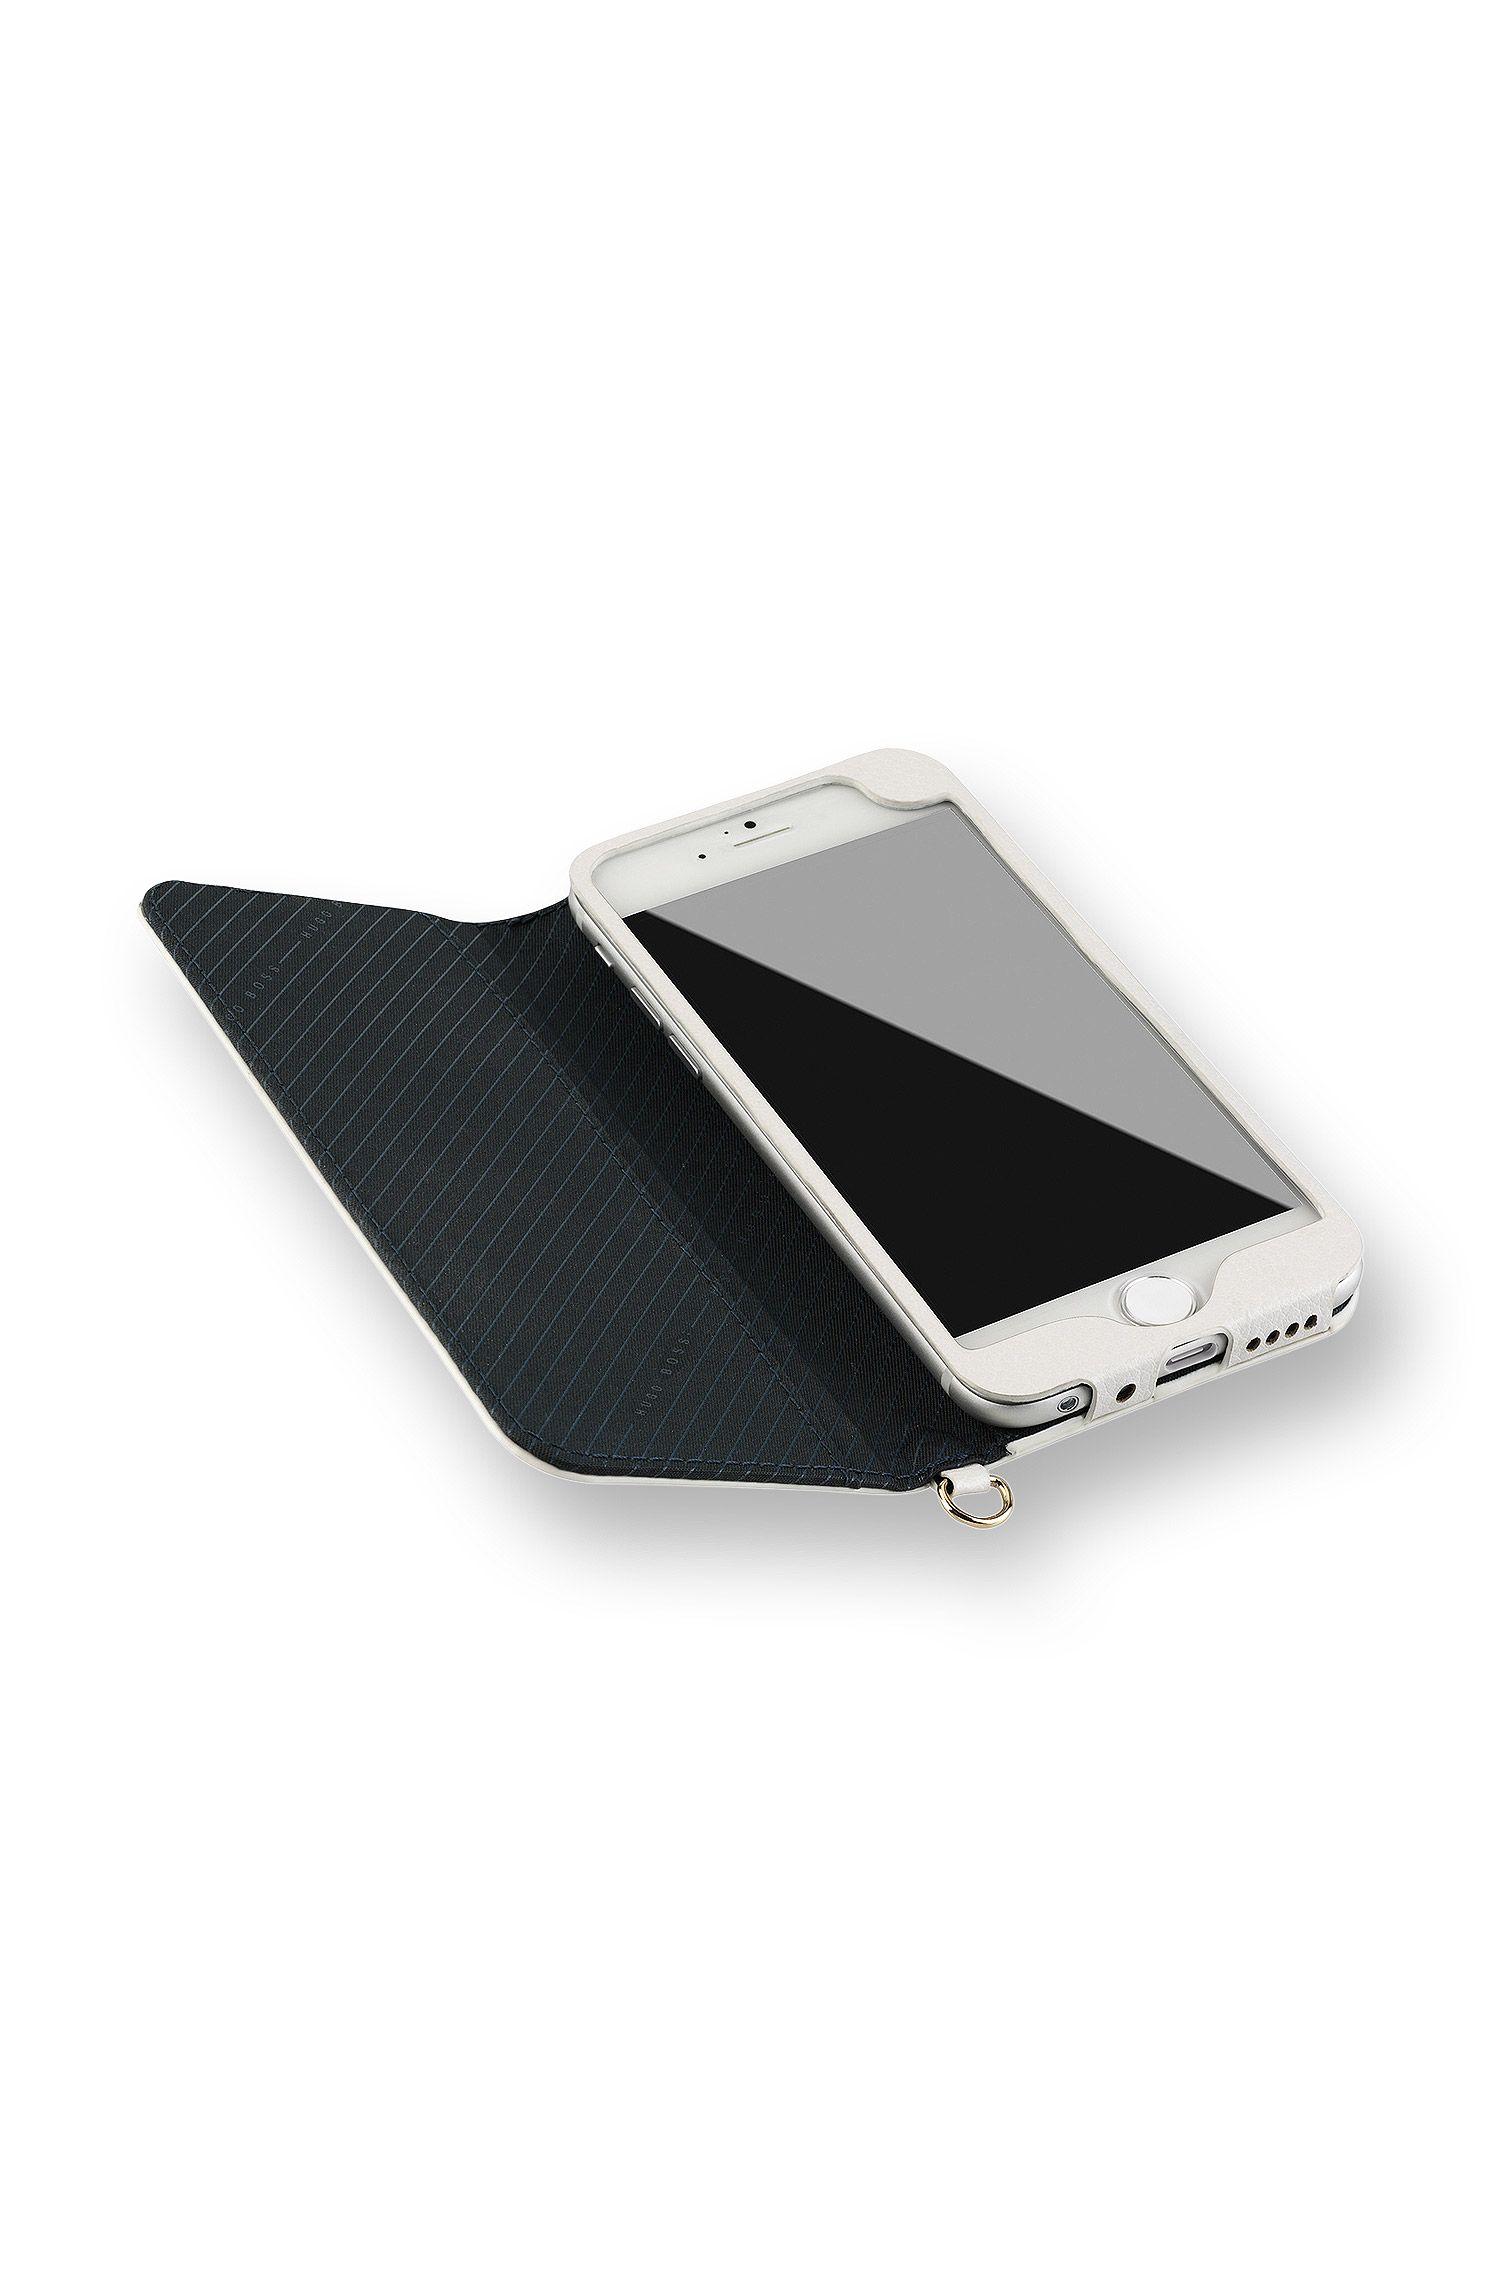 Étui portefeuille «Folianti IP6 4.7 - White» pour iPhone 6 4.7, Blanc